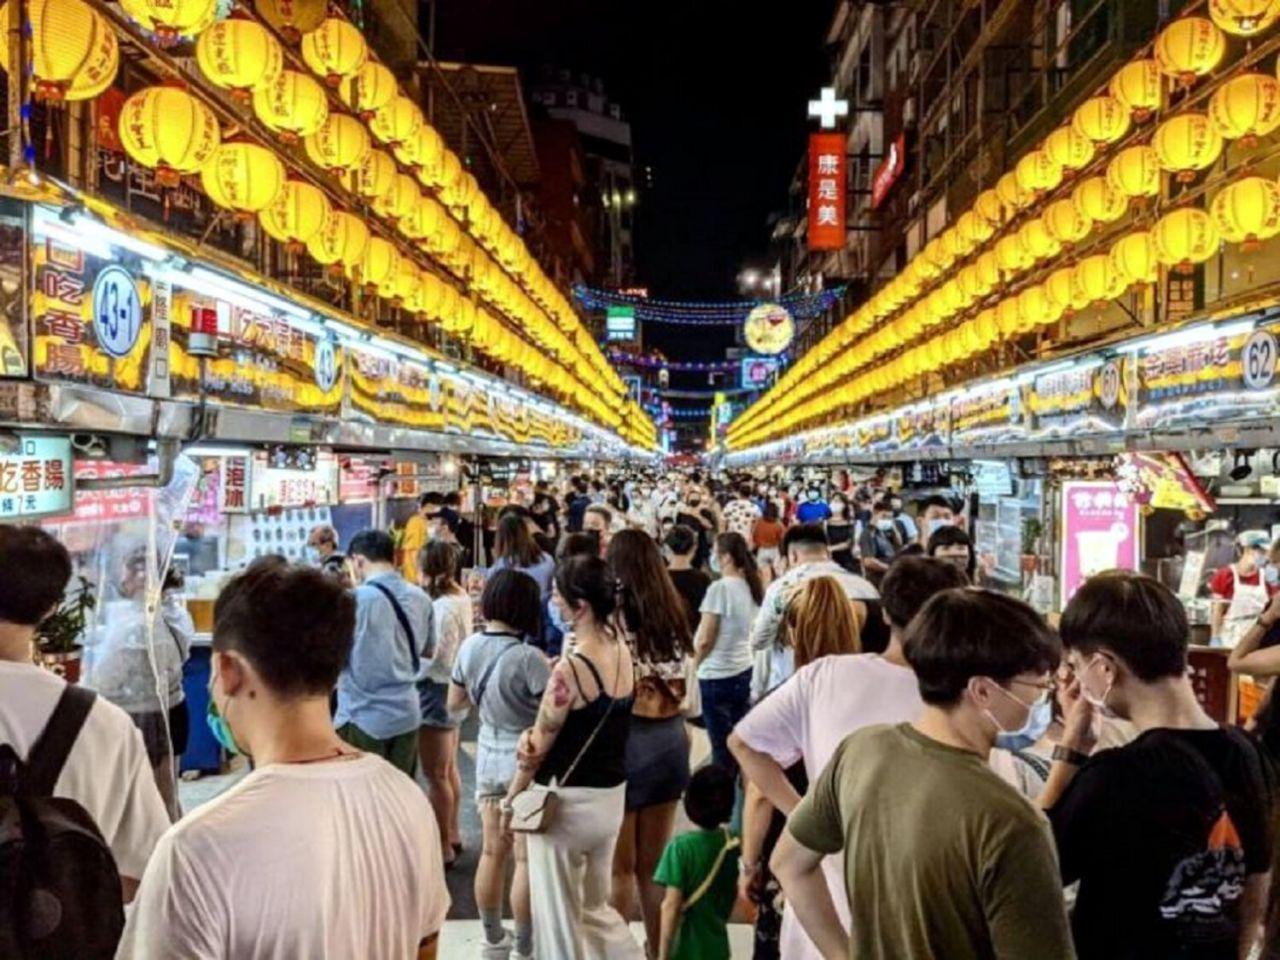 Keelung Miaokou Night Market- Keelung, Taiwán